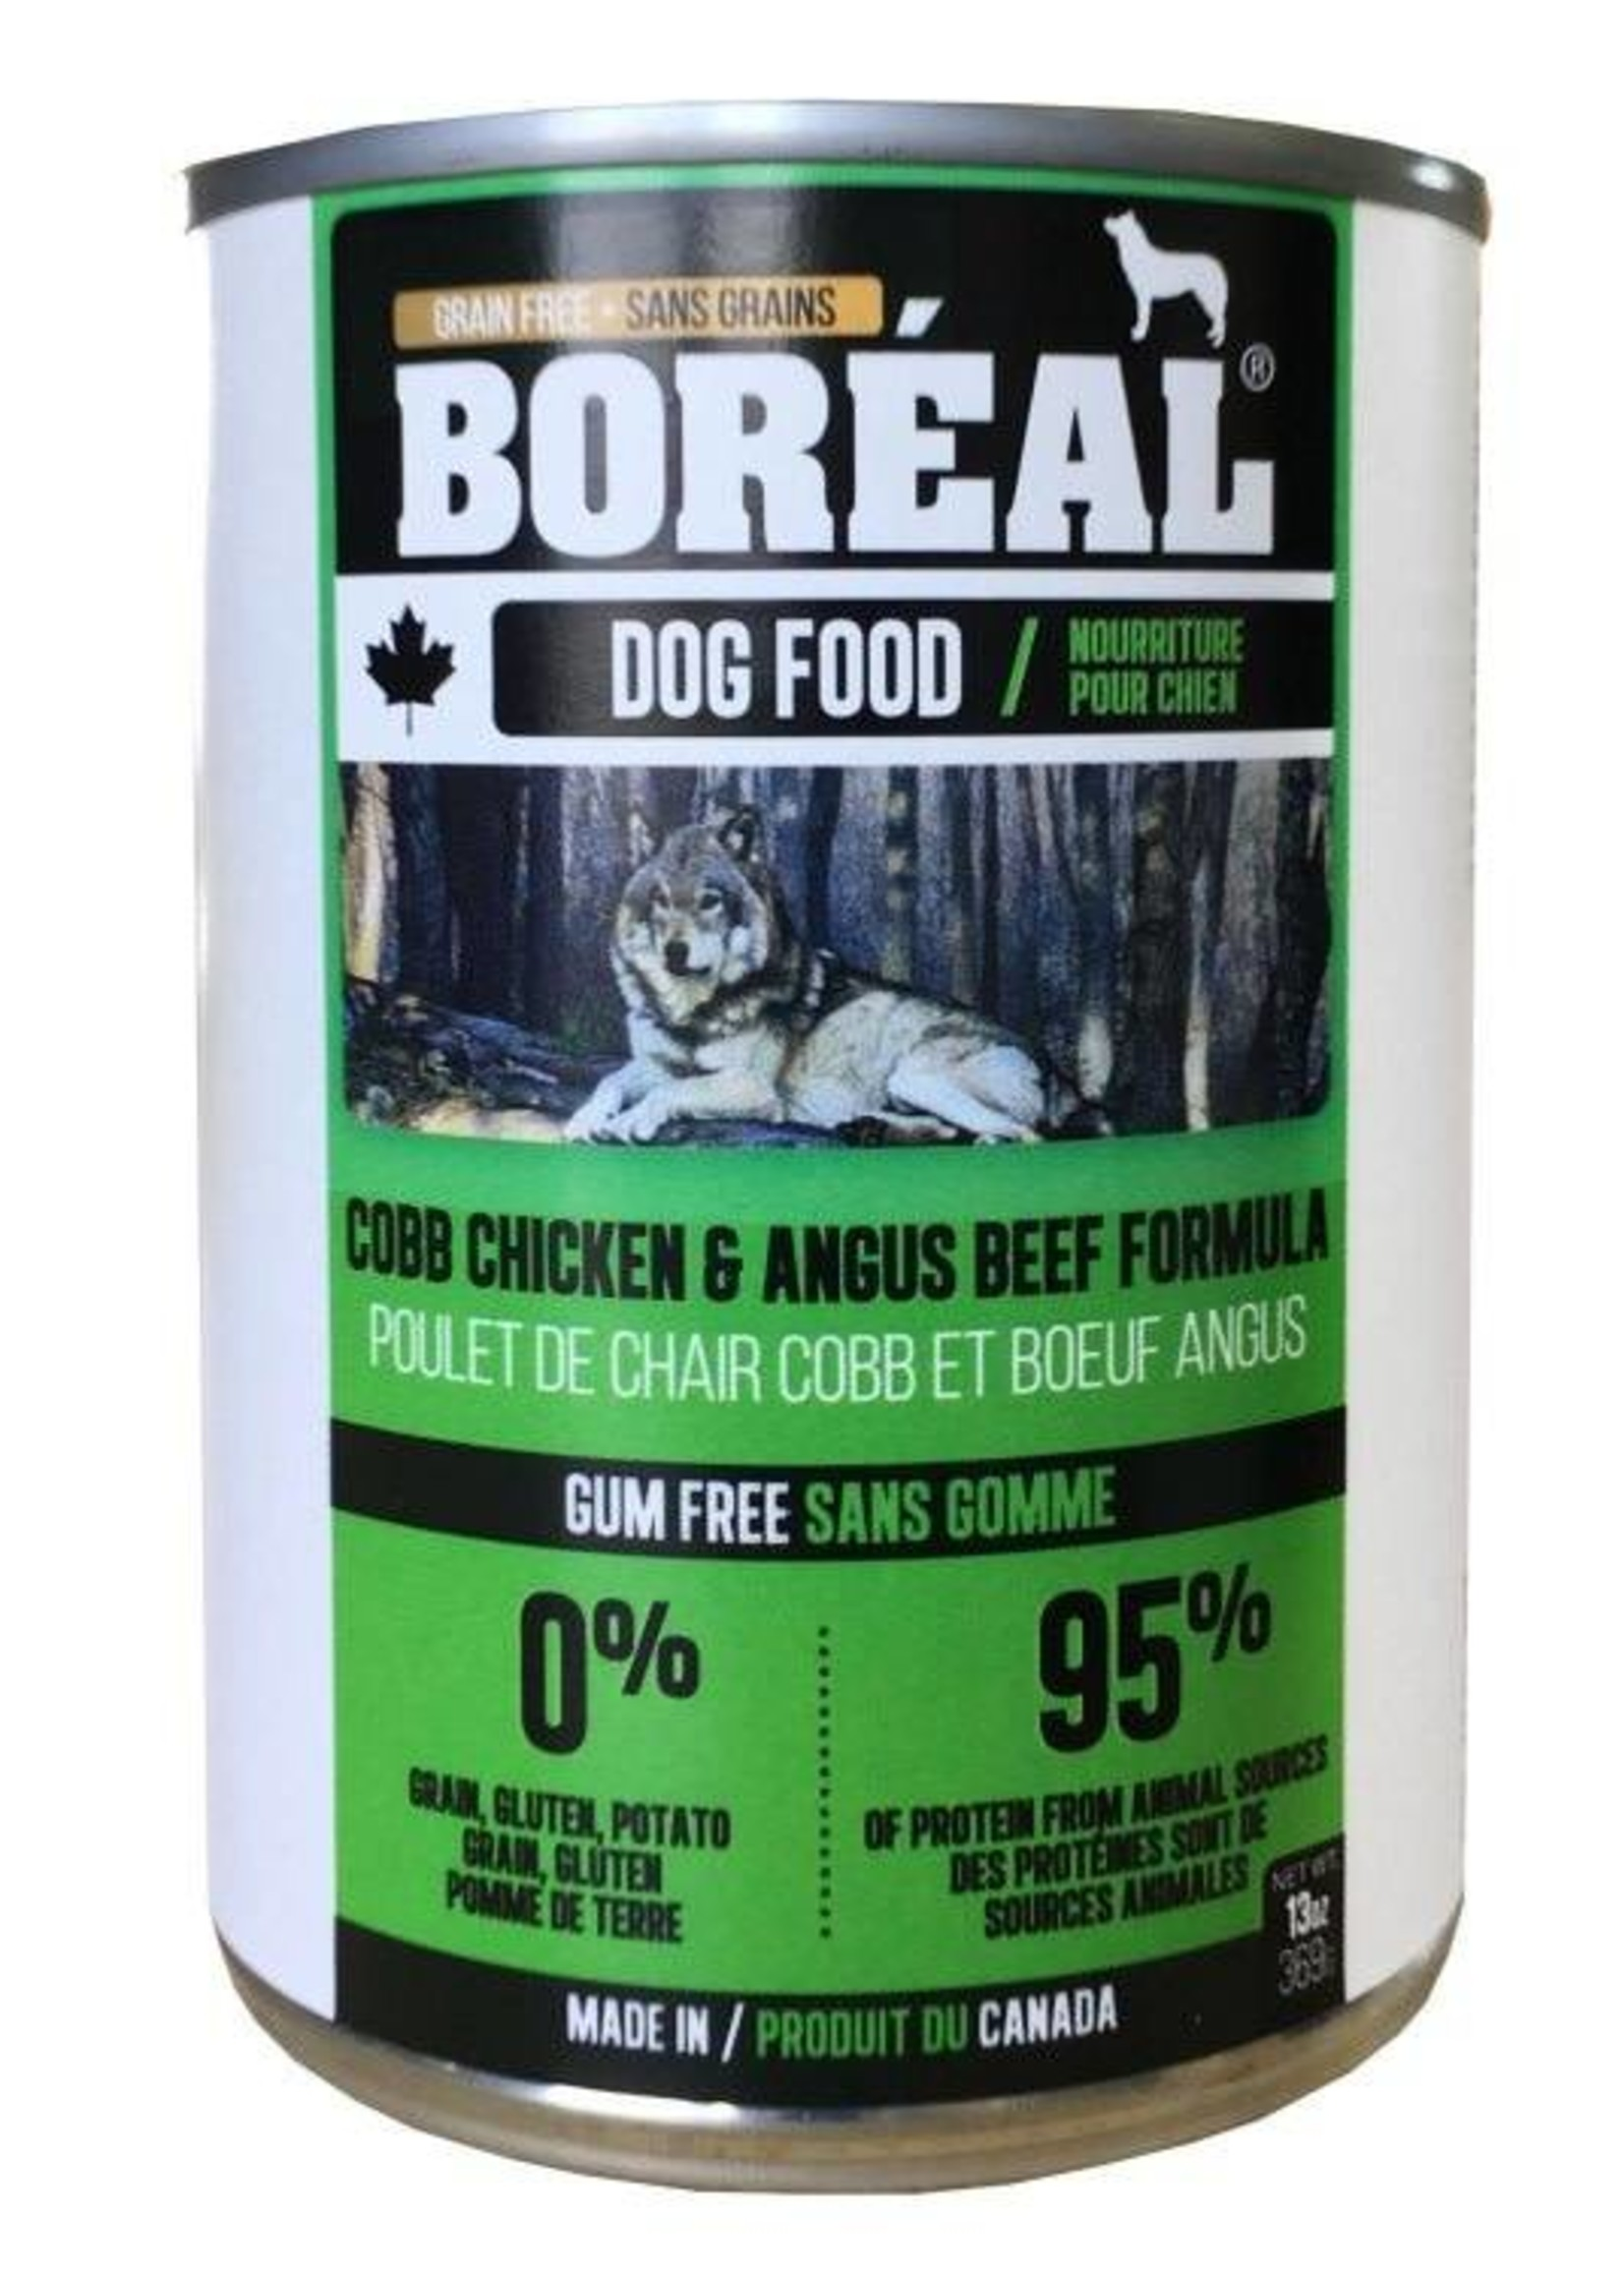 Boreal Boreal Dog Cobb Chicken & Angus Beef Formula 13oz